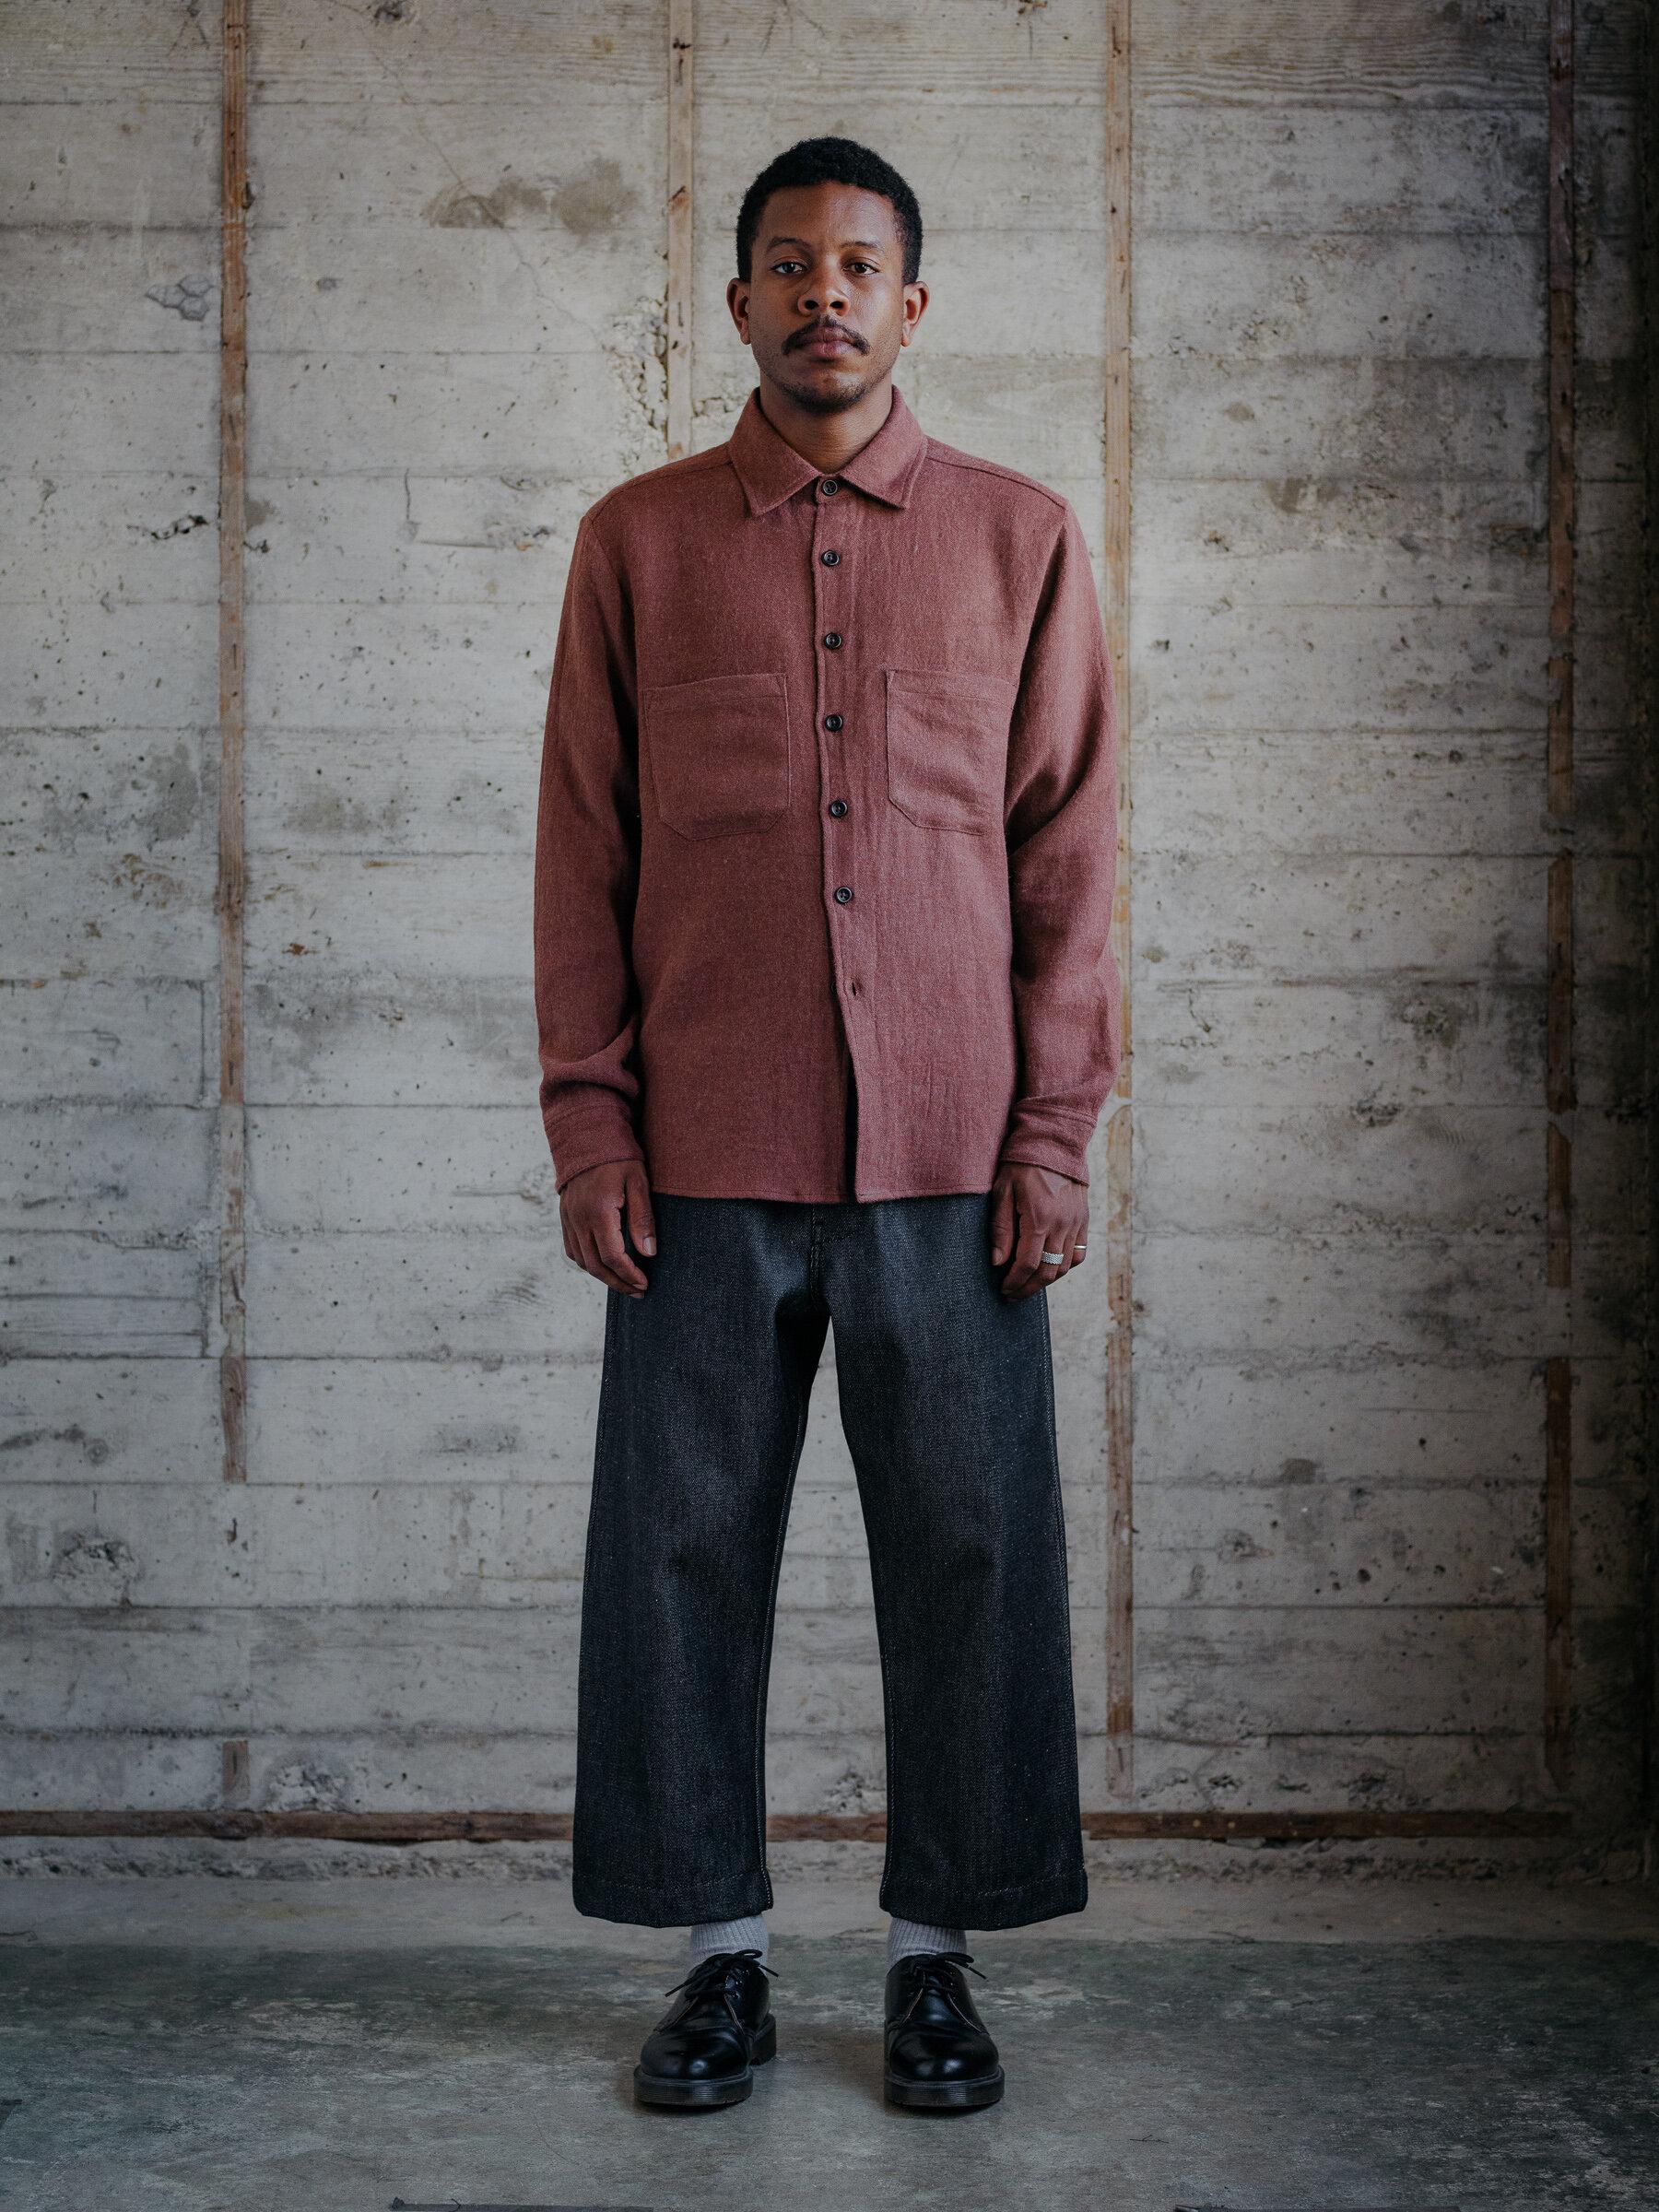 evan-kinori-two-pocket-shirt-linen-wool-twill-woven-in-japan-1